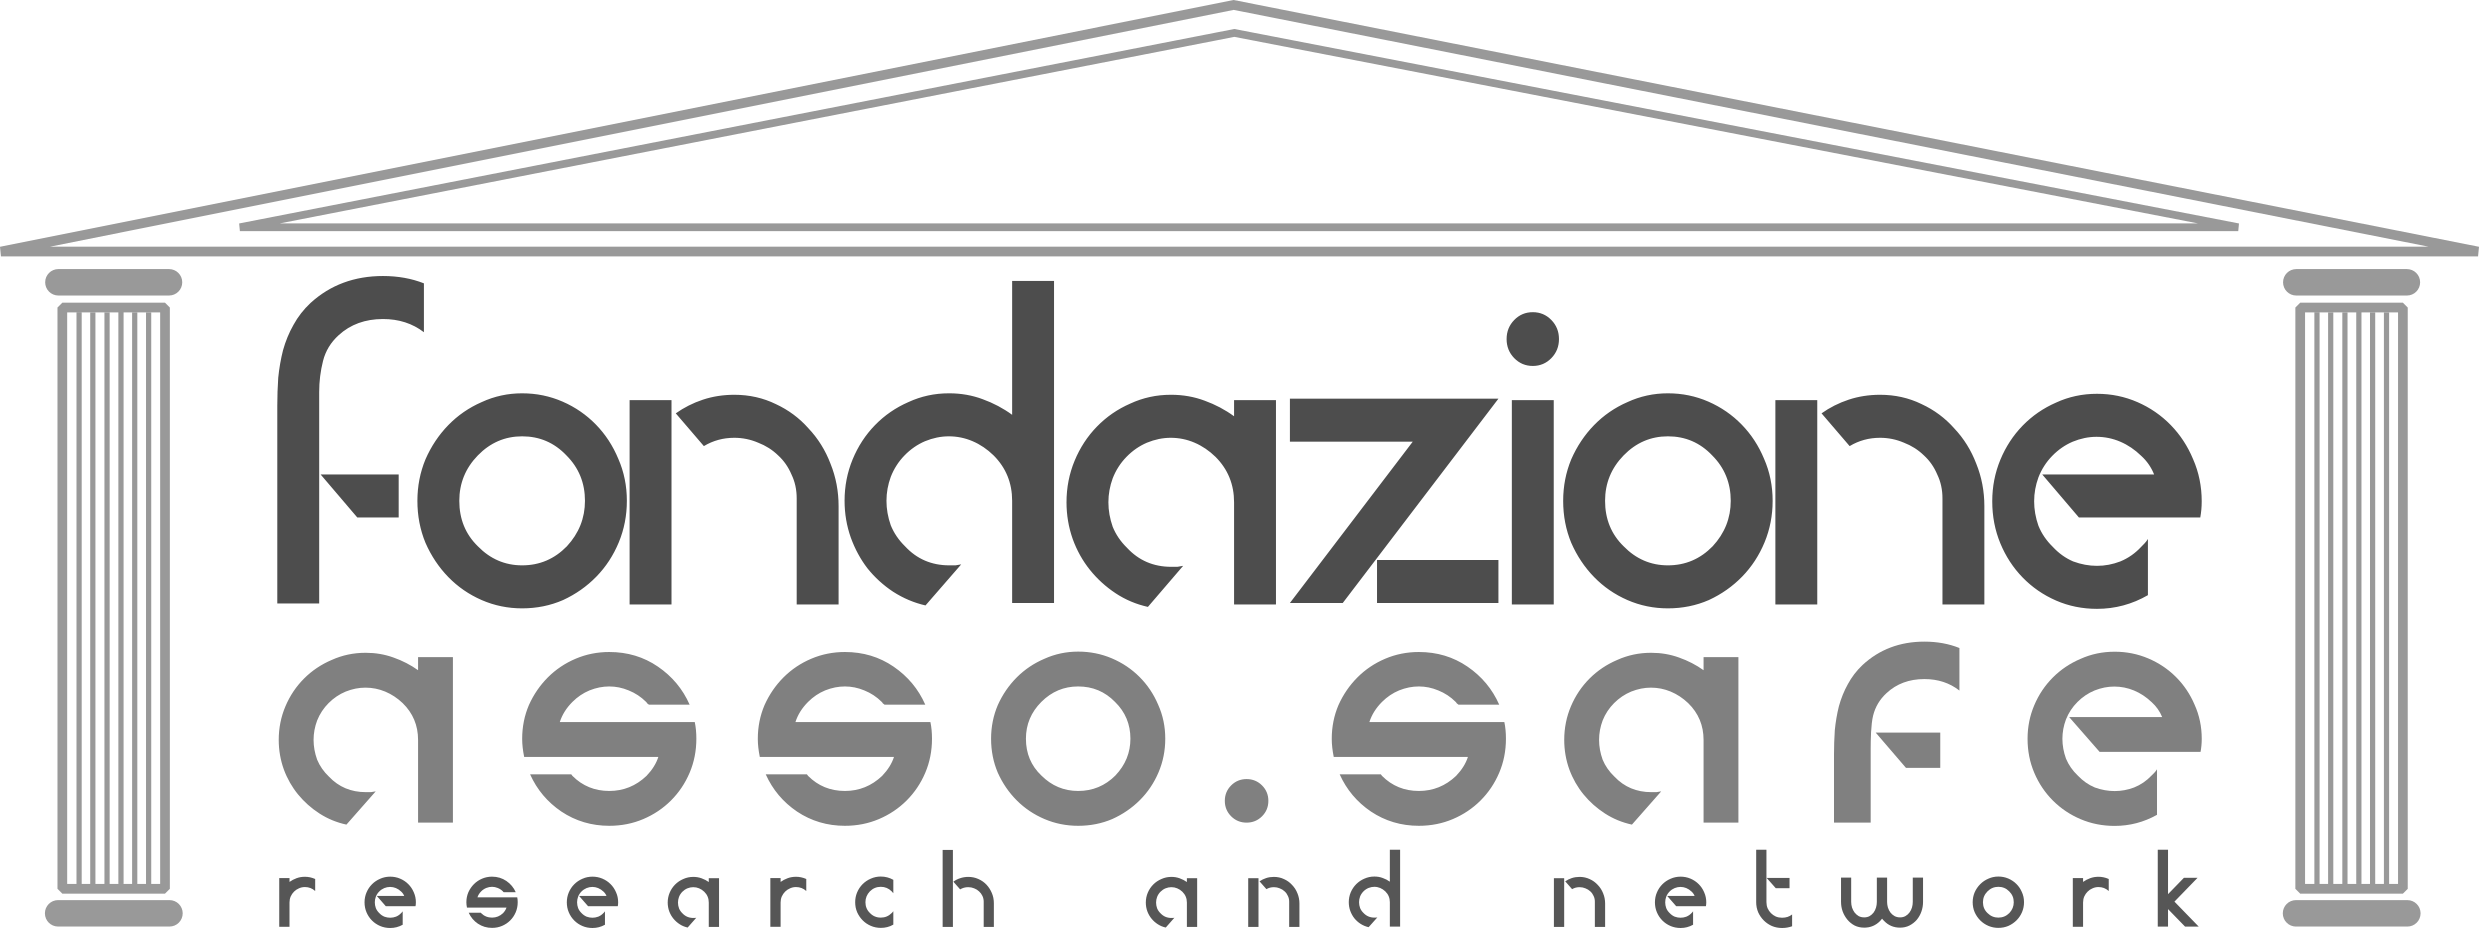 Fondazione Asso.Safe